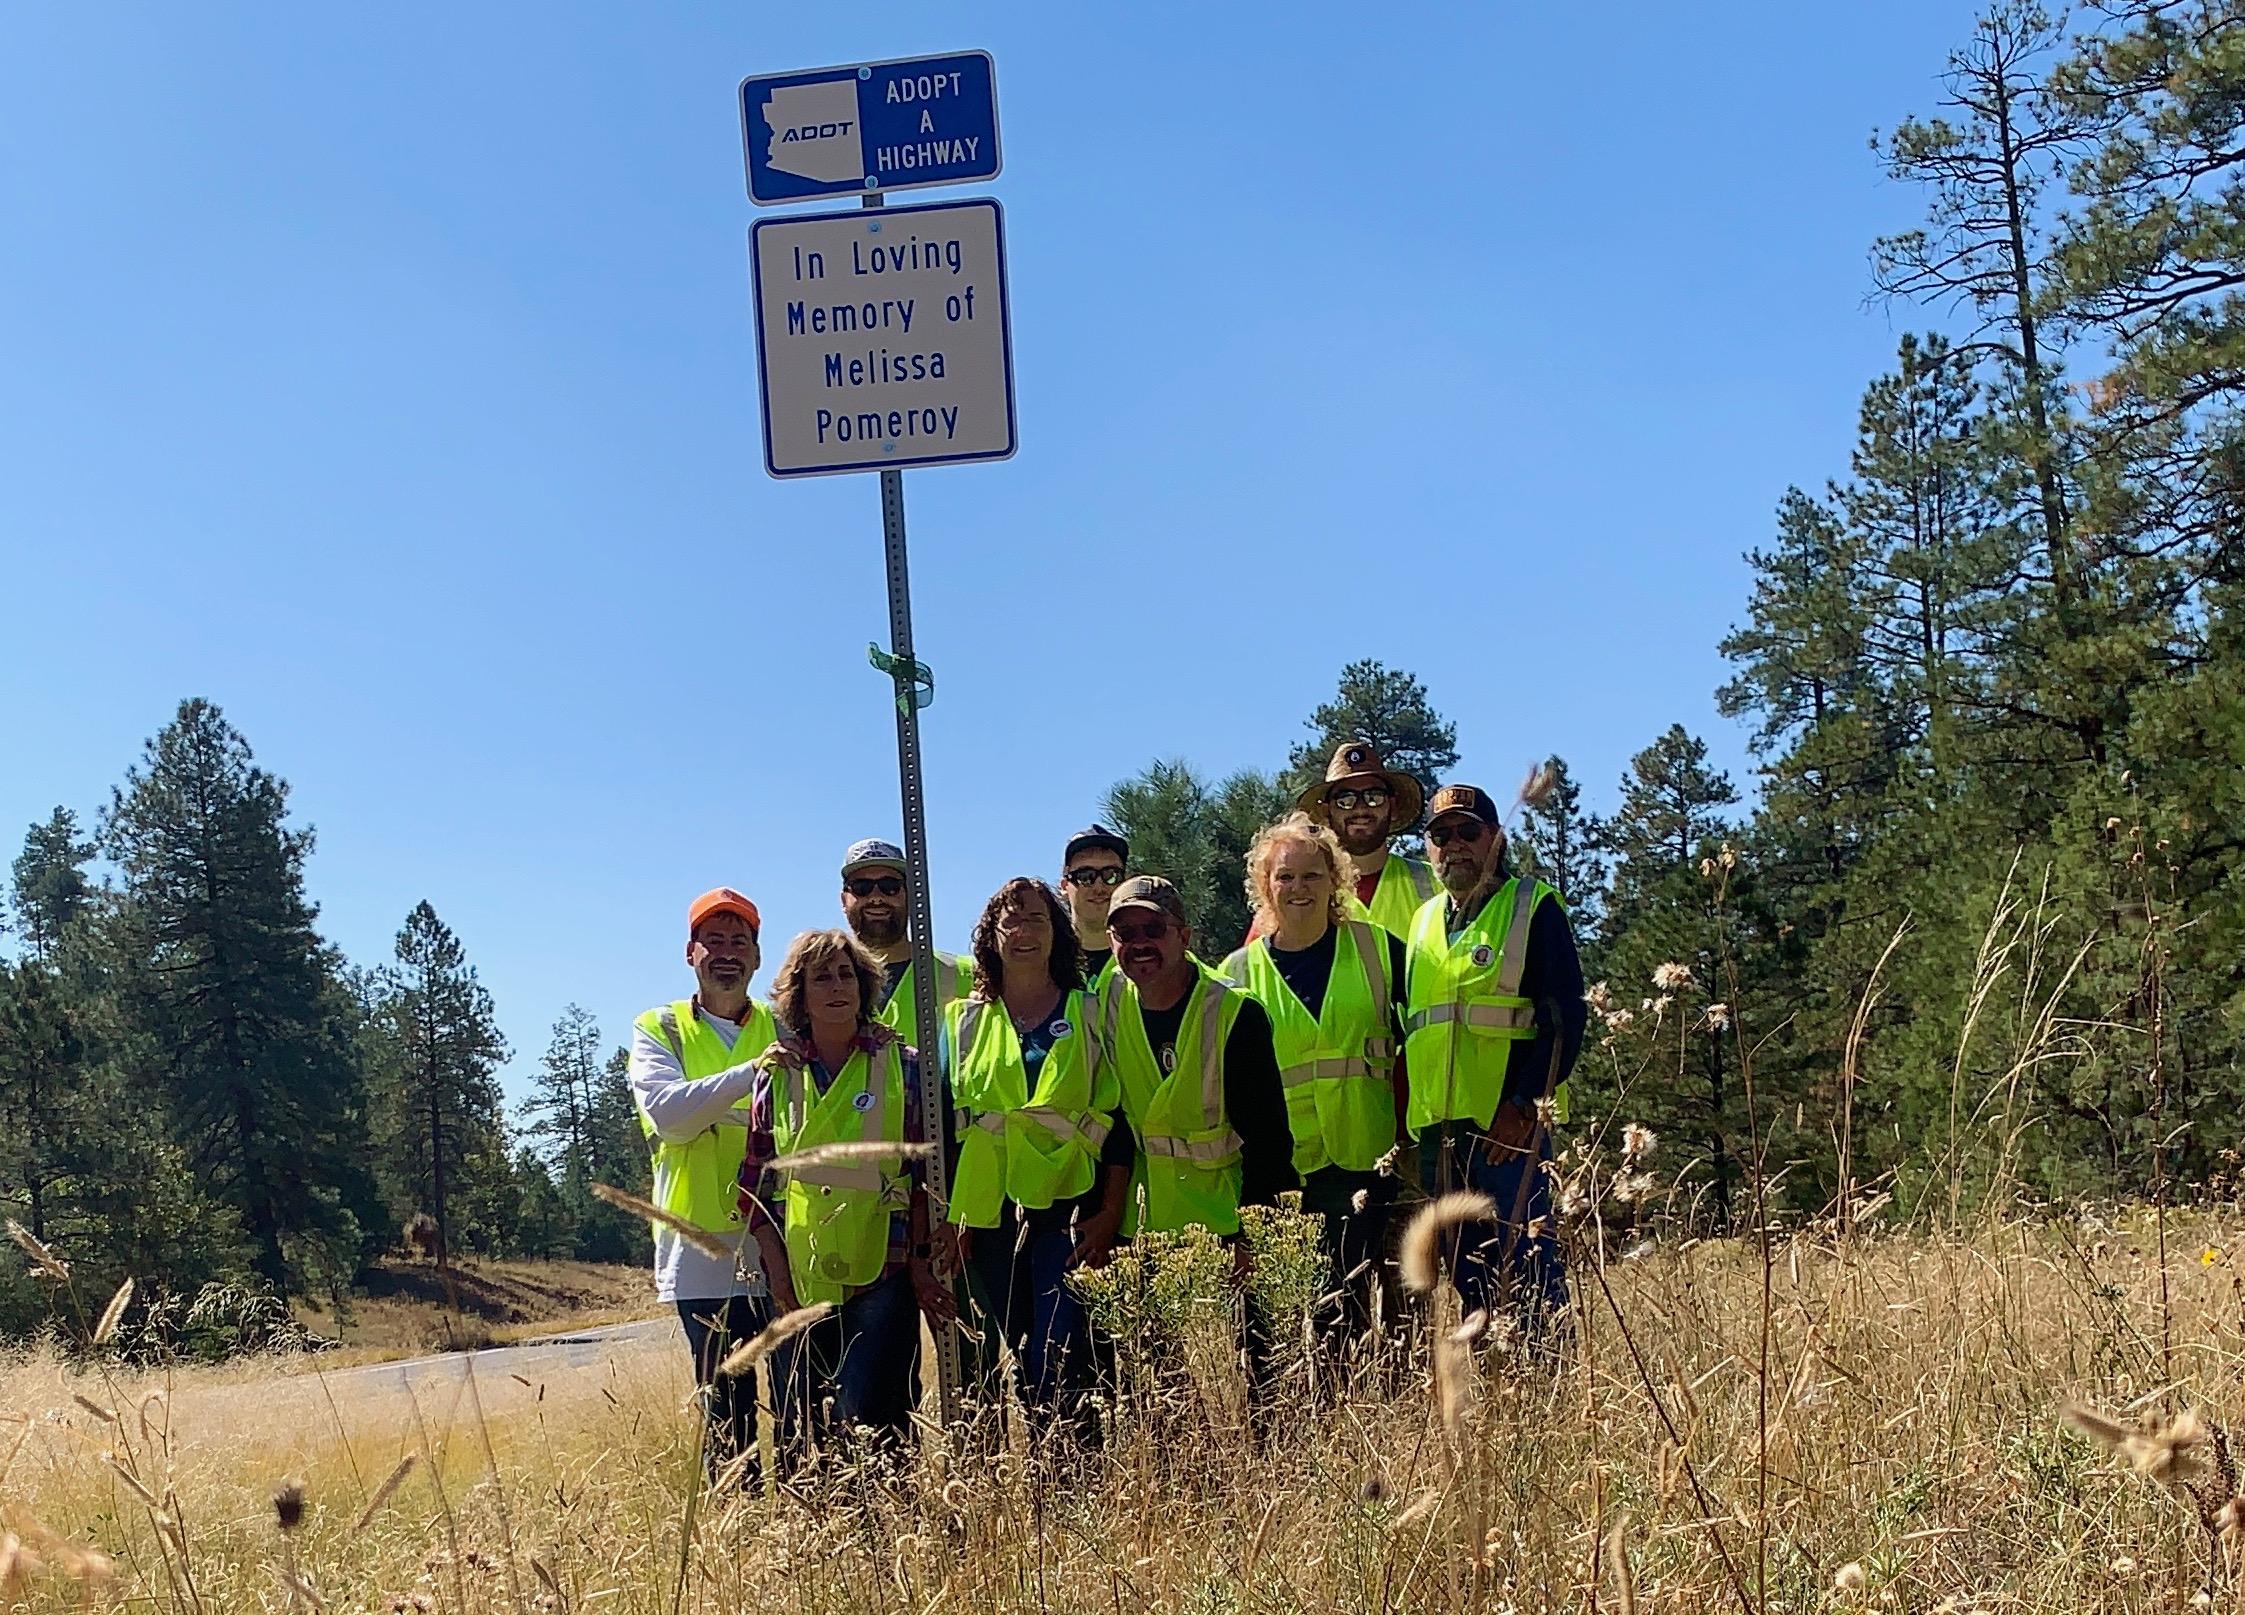 Adopt a Highway volunteer Show Low US 60 in memory of Melissa Pomeroy